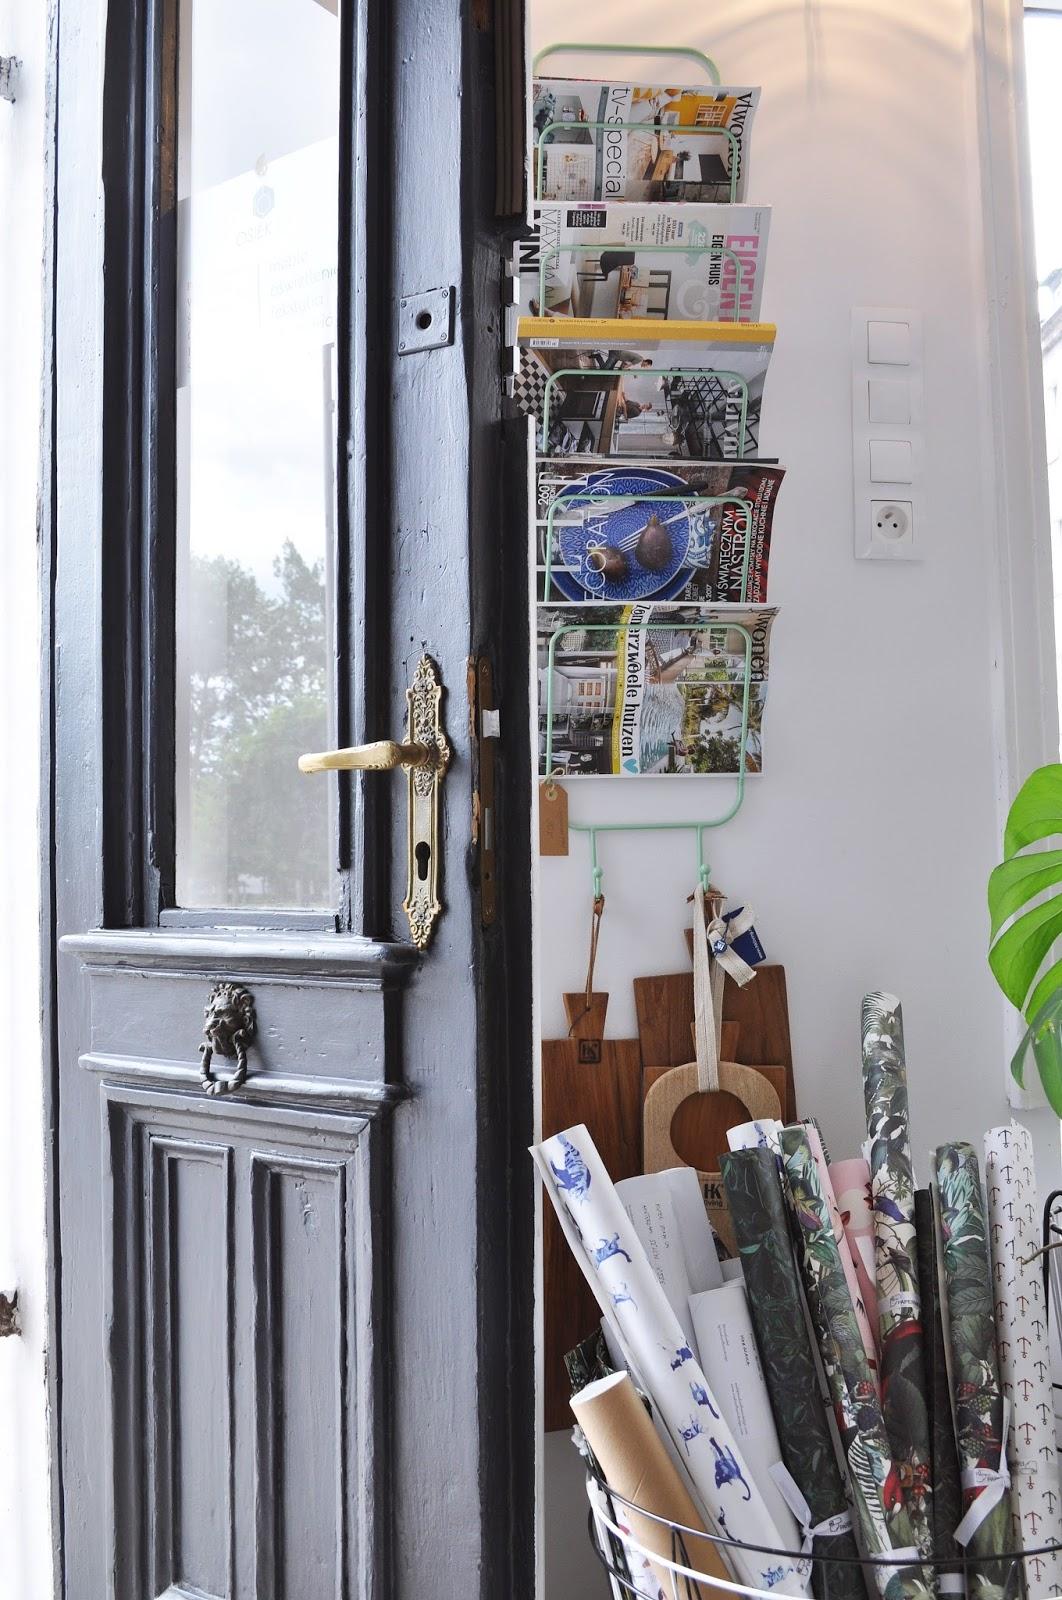 Design your home osiek 10 sklep pracownia Home design sklep online